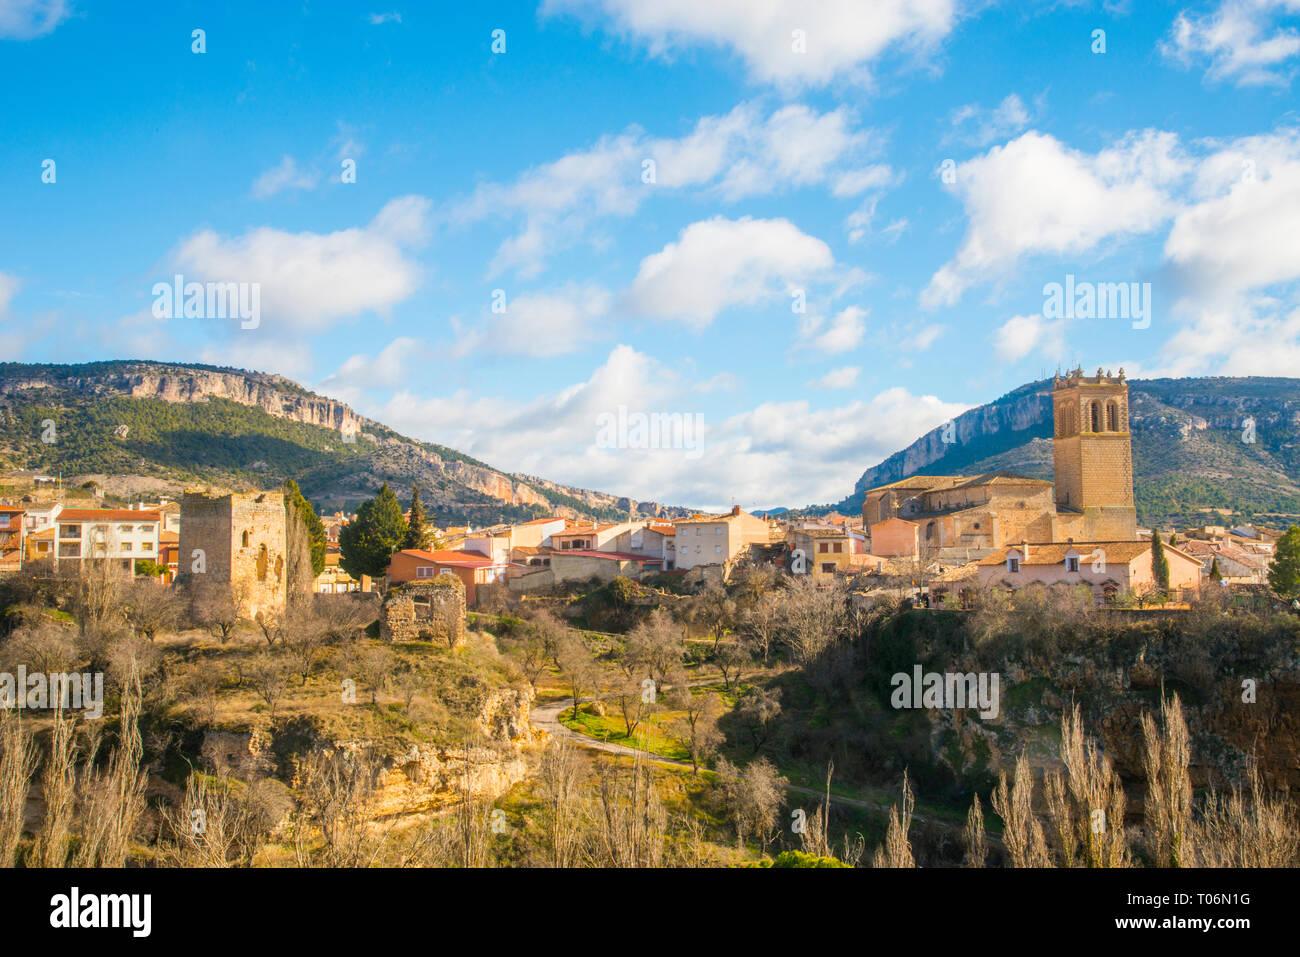 Overview. Priego, Cuenca province, Castilla La Mancha, Spain. - Stock Image